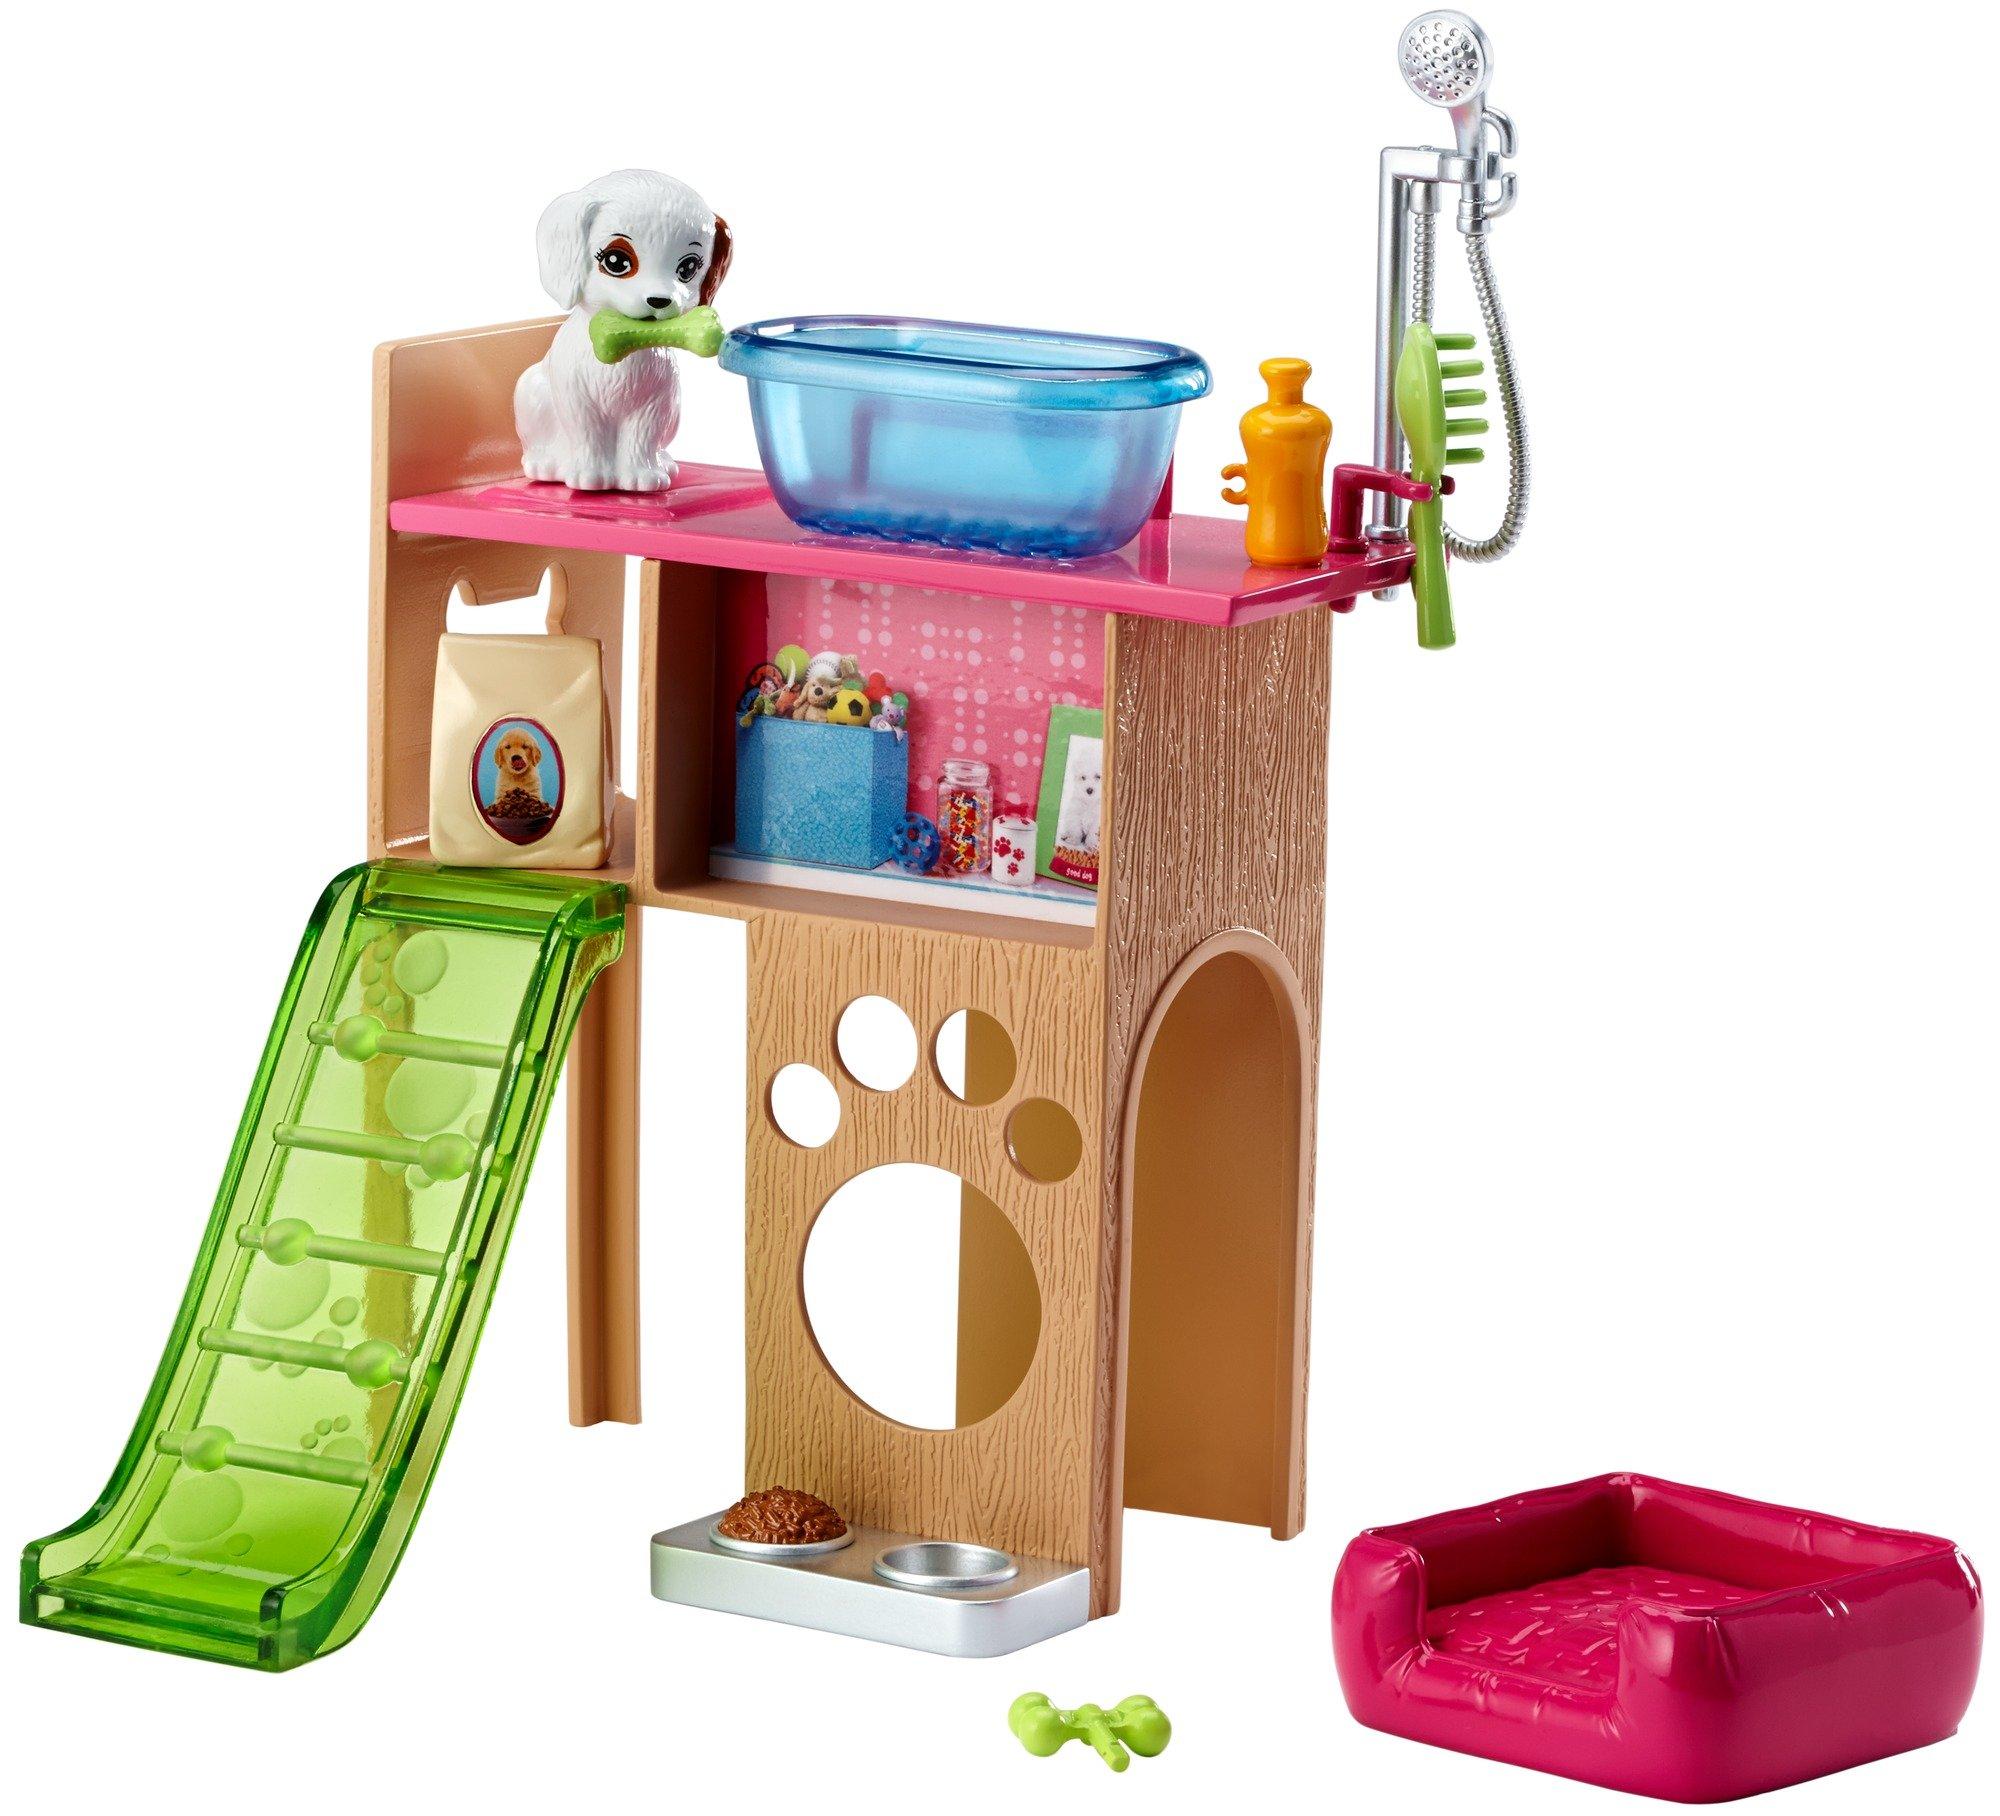 Barbie Pet Room & Accessories Playset